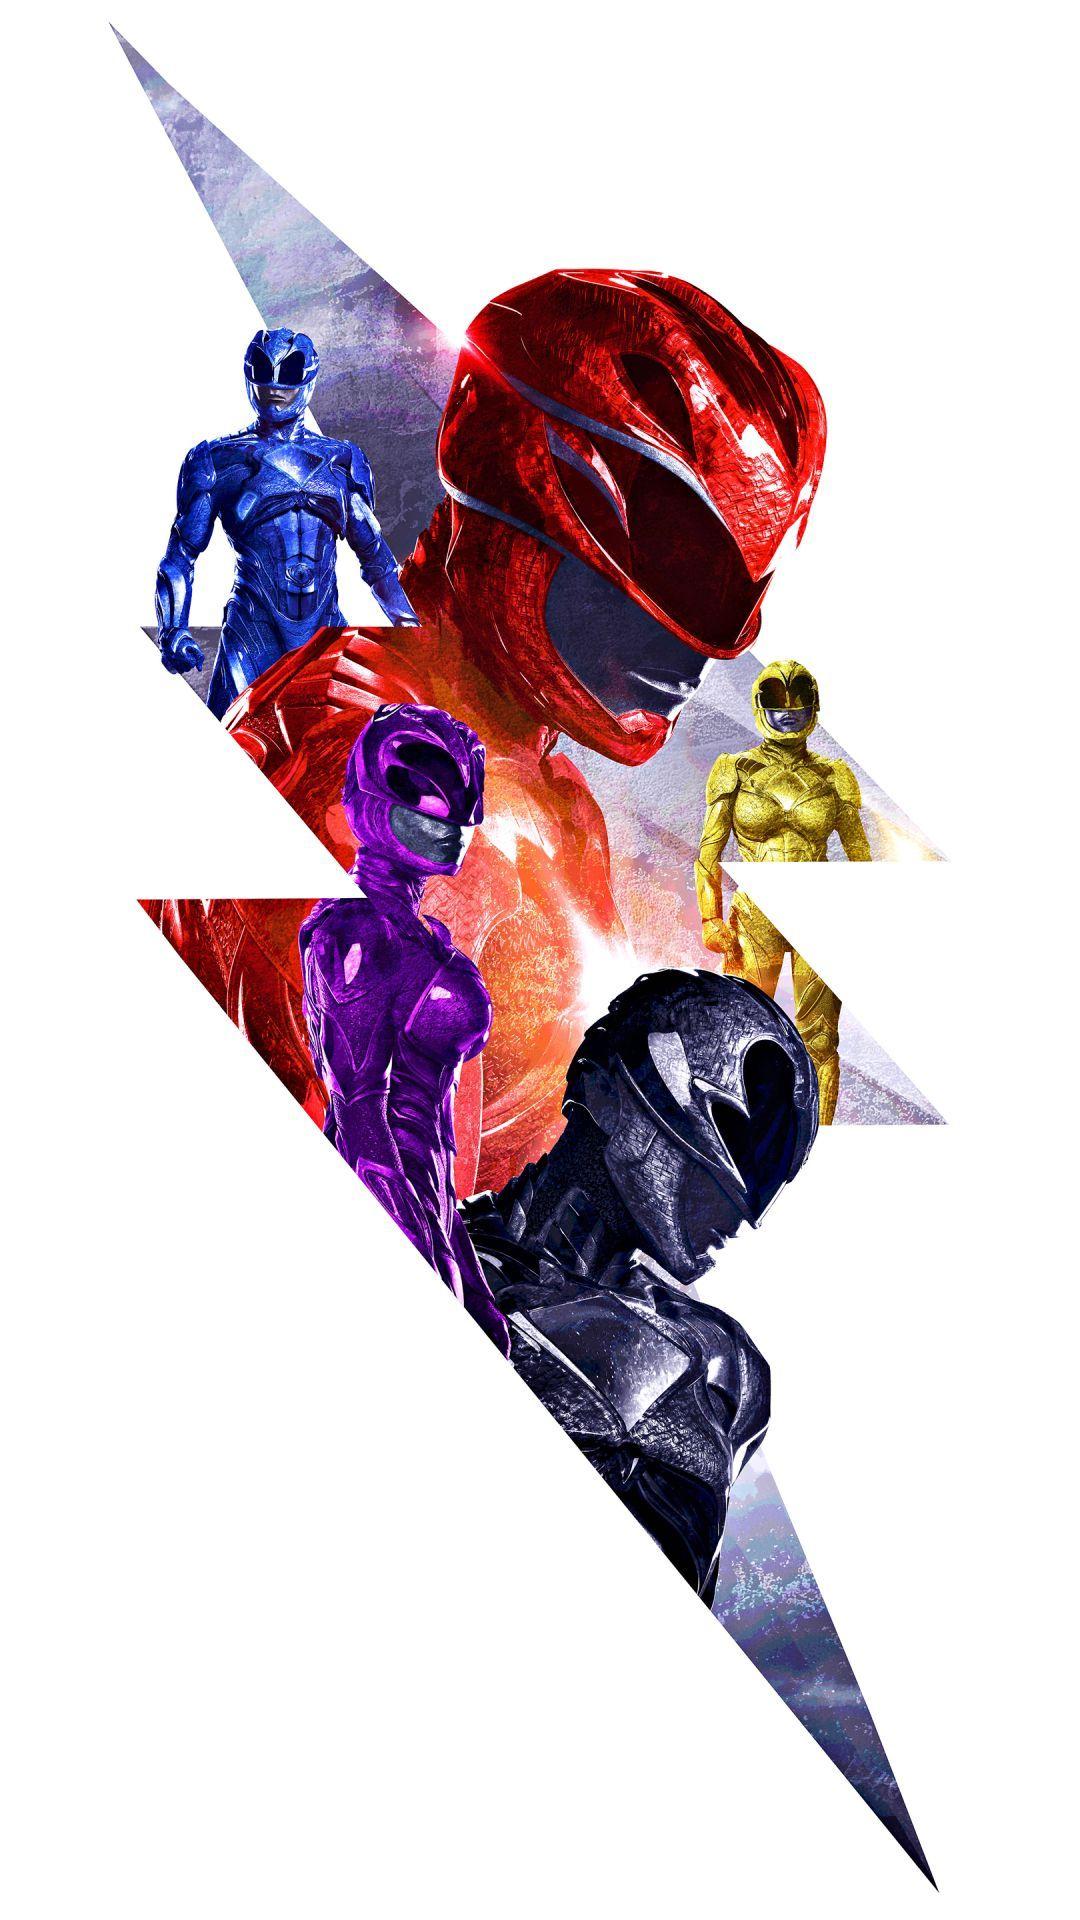 Power Rangers Phone Wallpapers   Top Power Rangers Phone 1080x1920